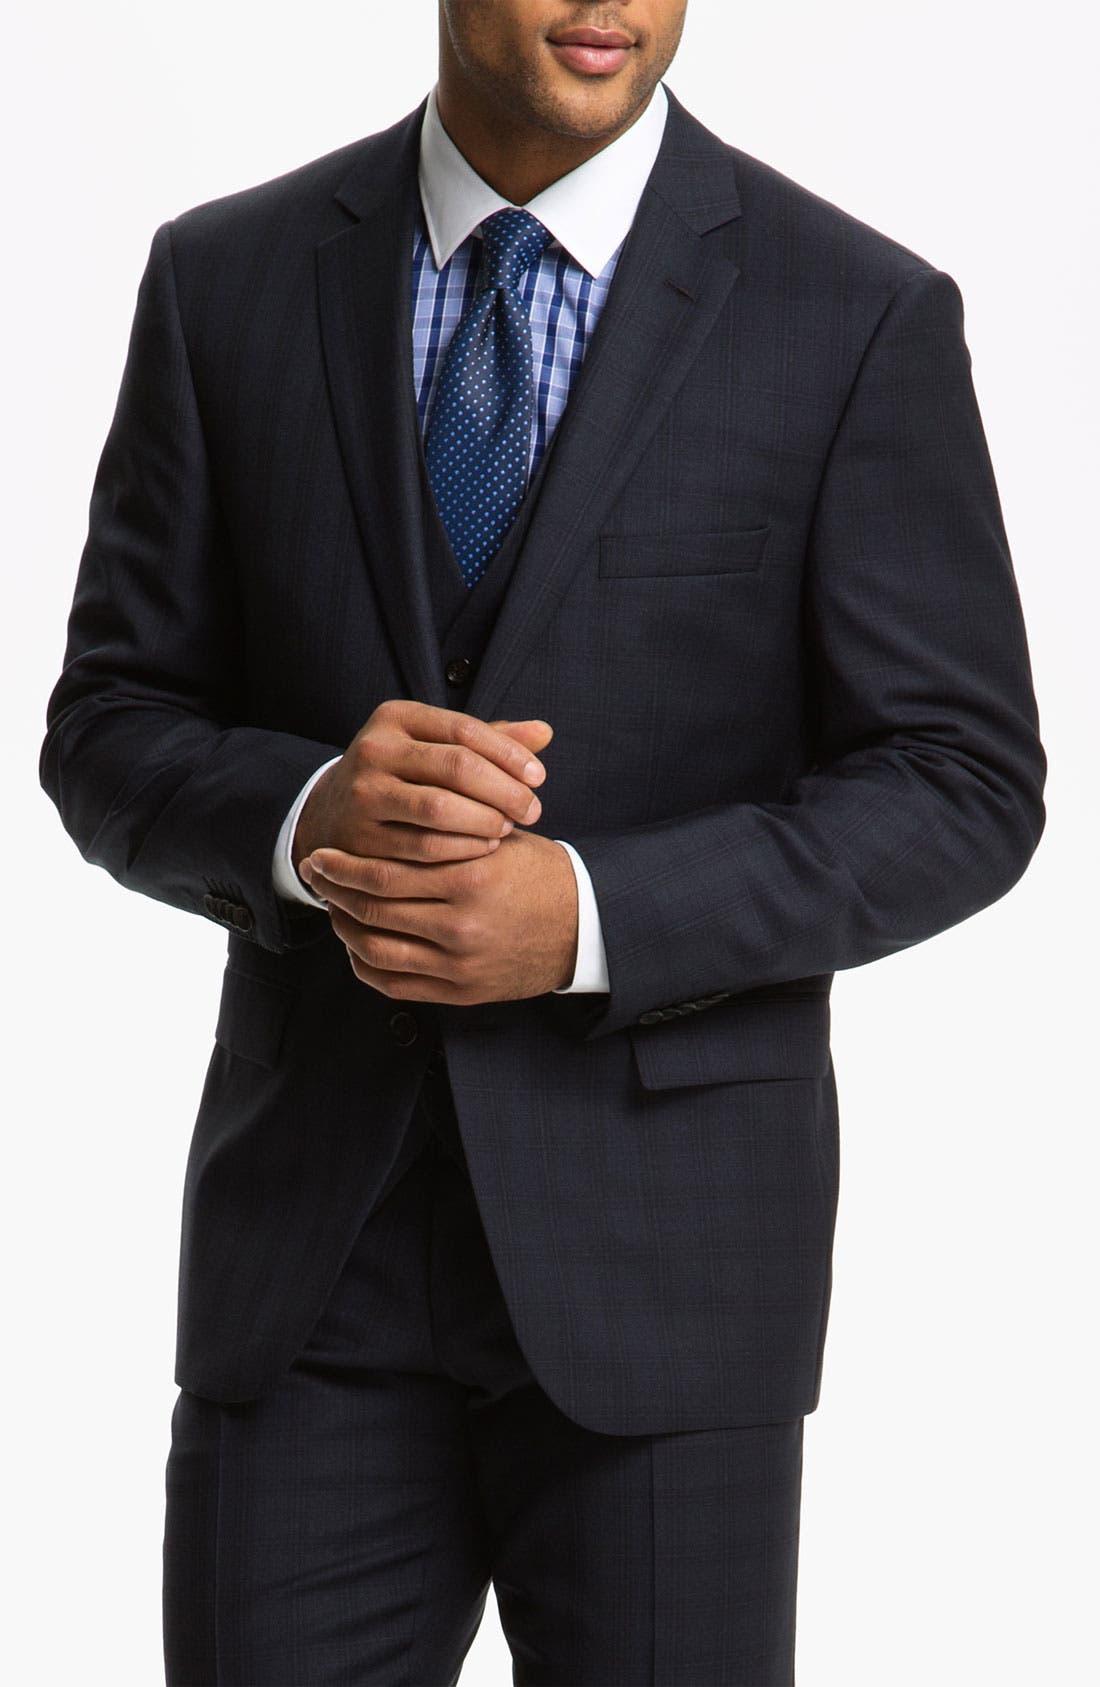 Alternate Image 1 Selected - BOSS Selection Suit & BOSS Black Dress Shirt